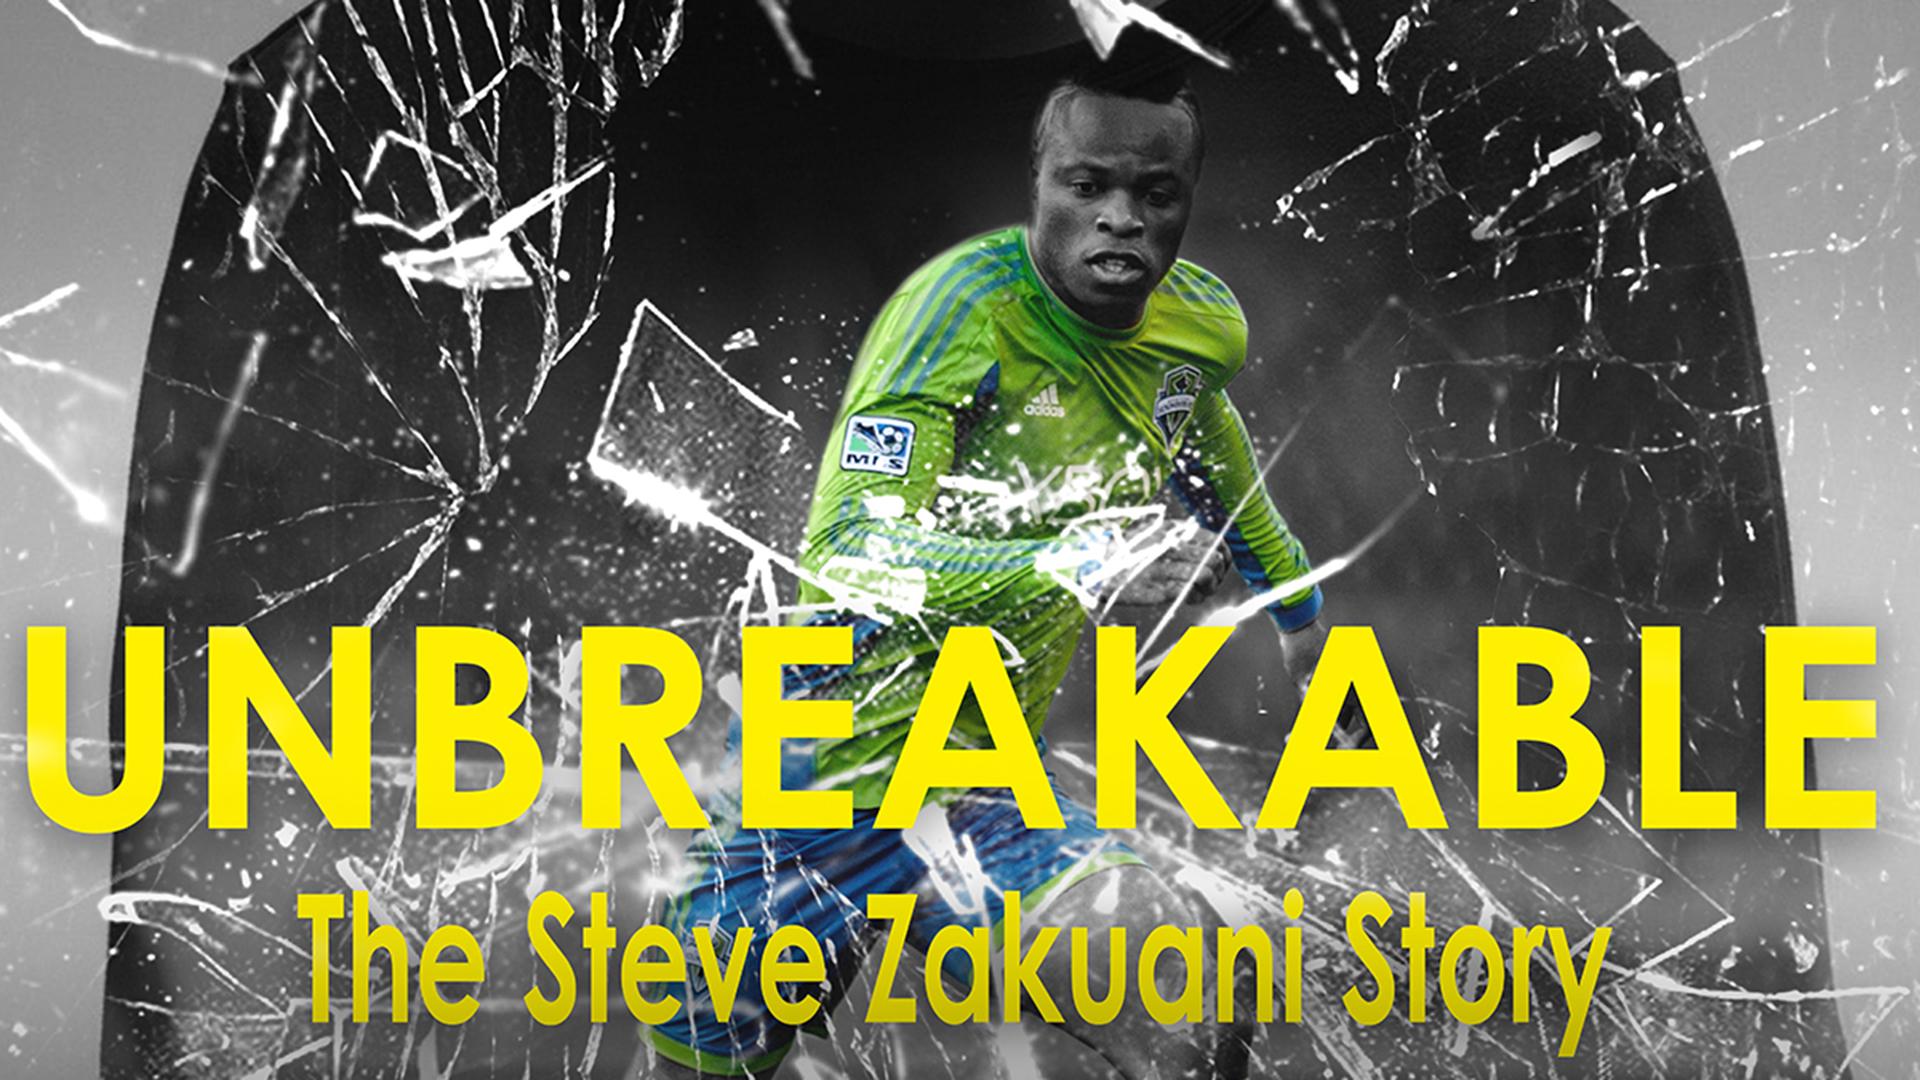 Unbreakable - The Steve Zakuani Story